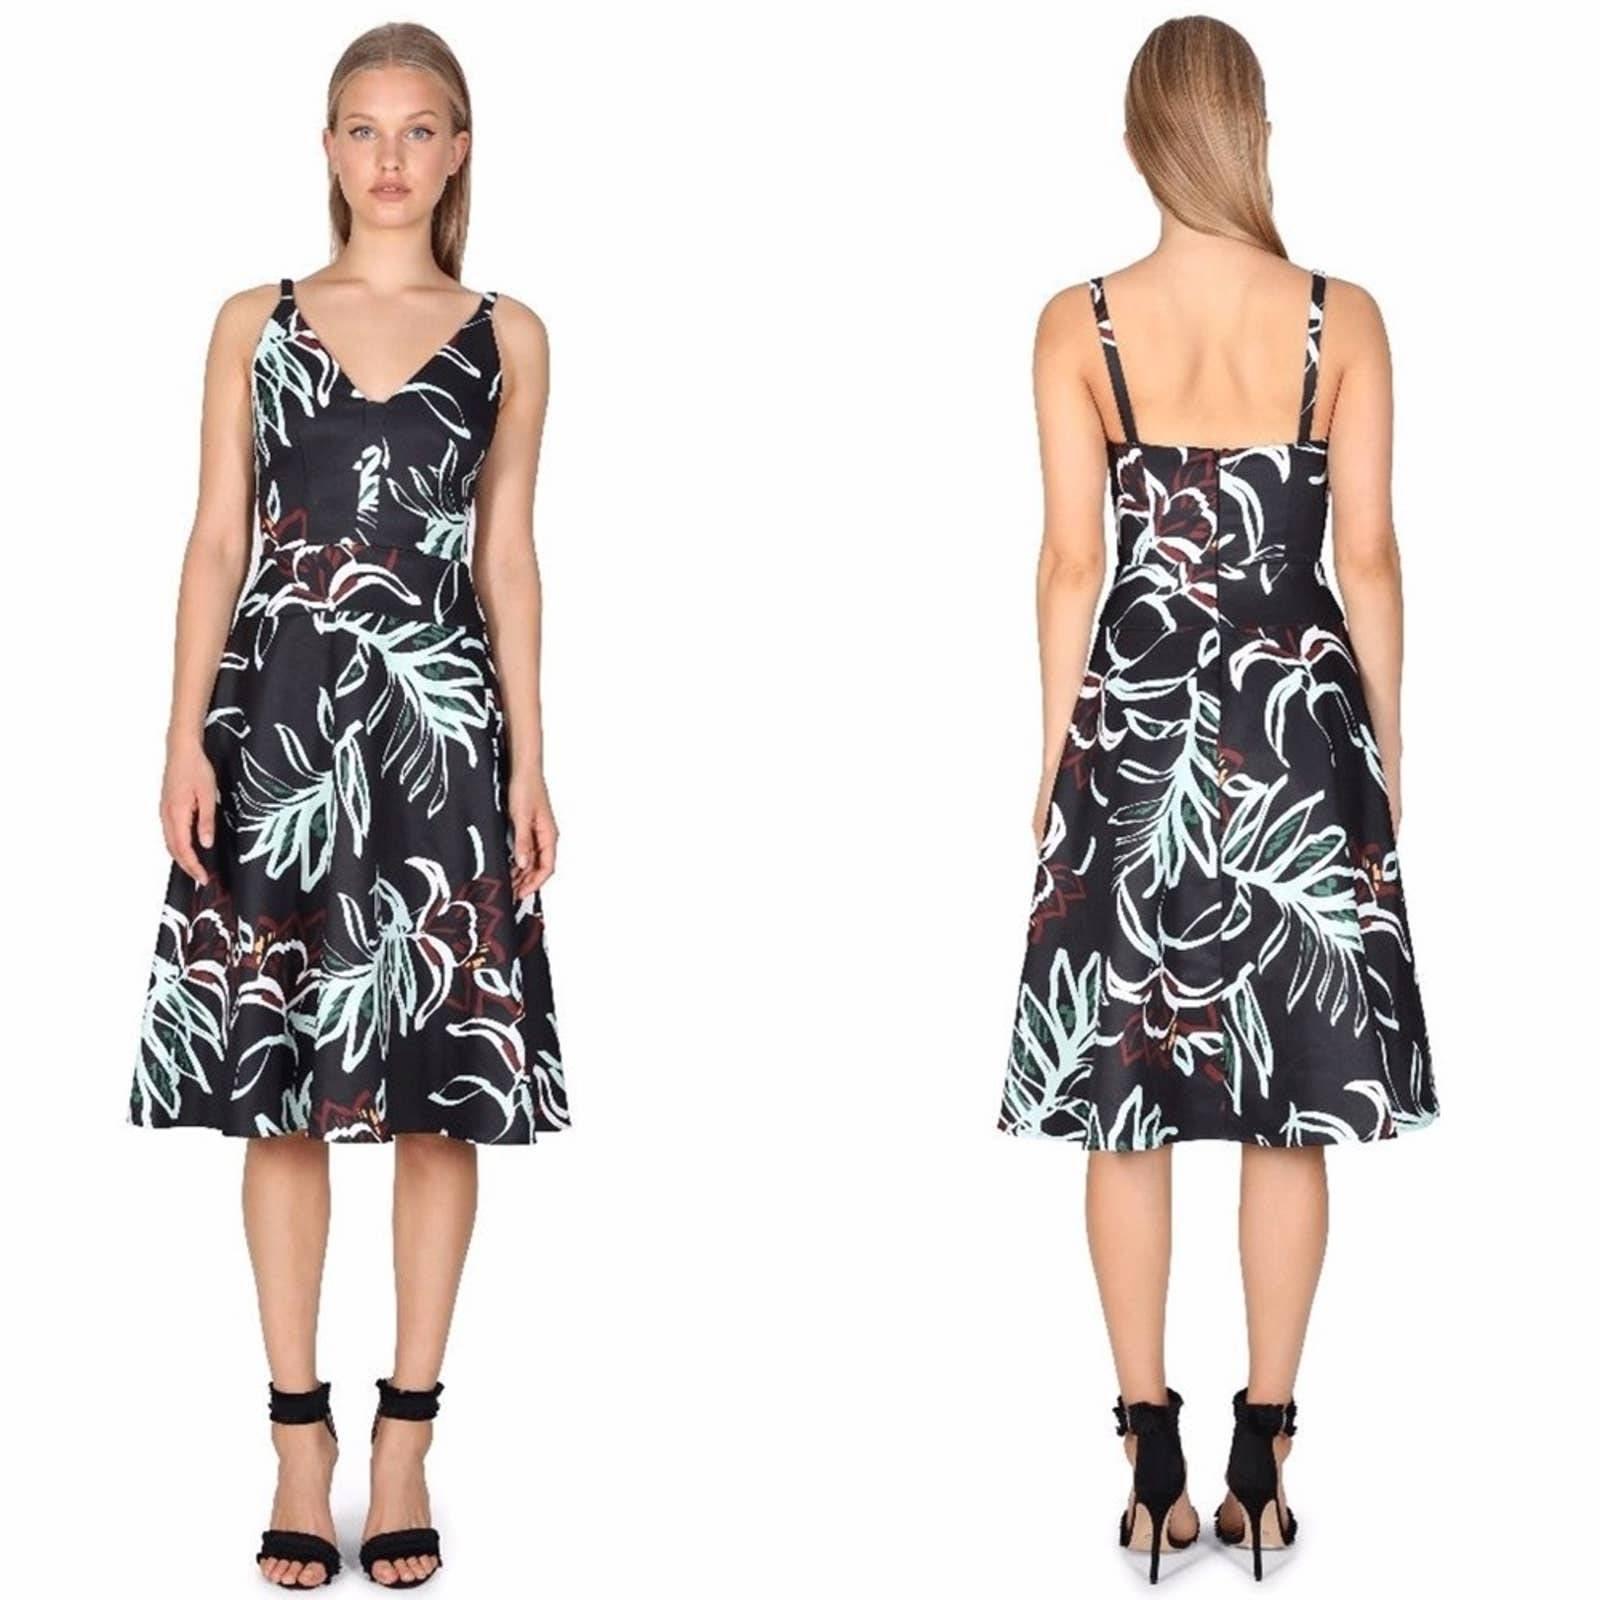 Cooper St. Rainforest Fit N Flare Dress